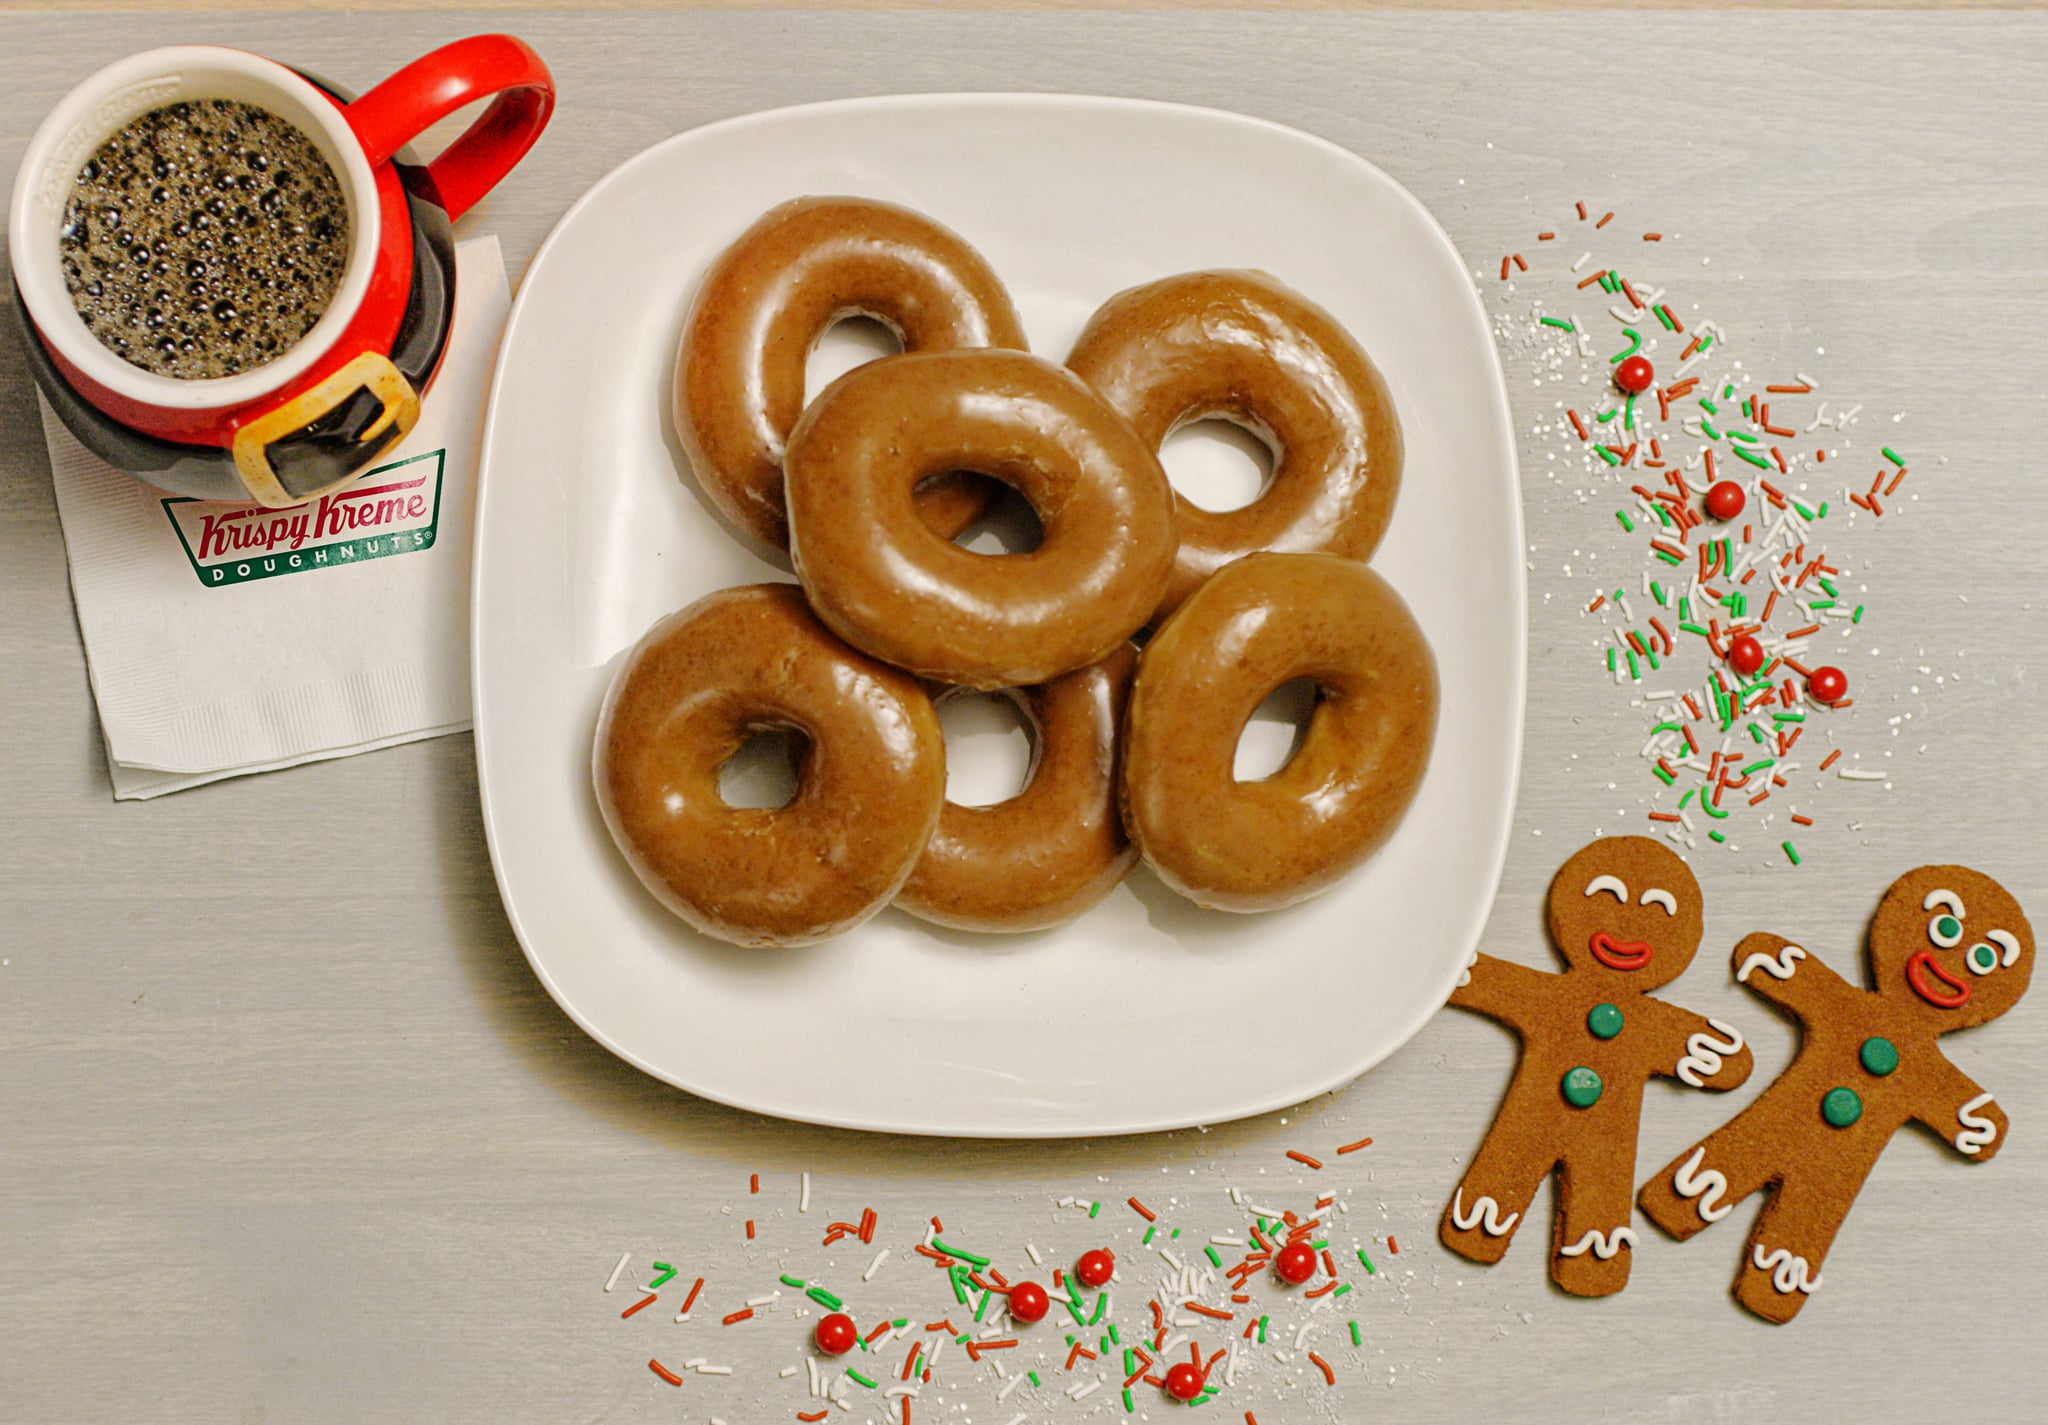 Krispy Kreme Is Making a Gingerbread Glazed Doughnut for One Day Only